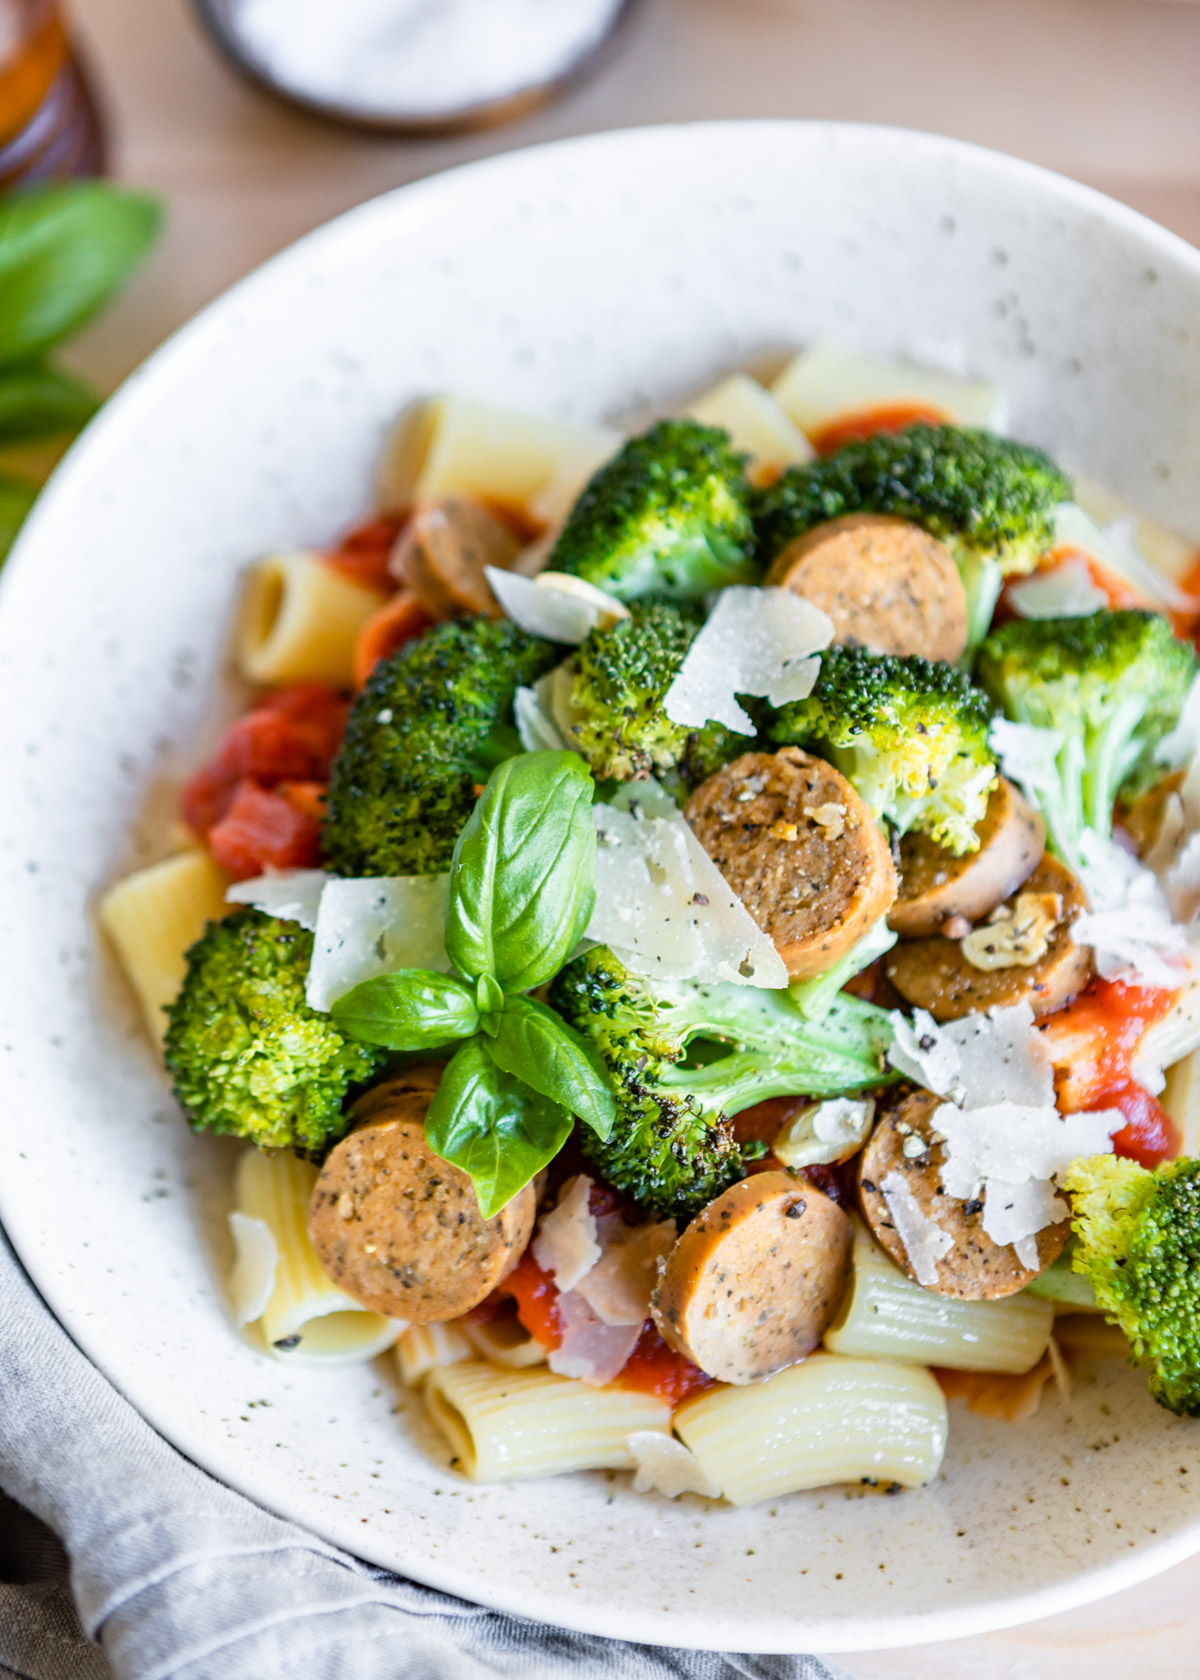 Sheet Pan Garlic Broccoli and Italian Sausage with Pasta